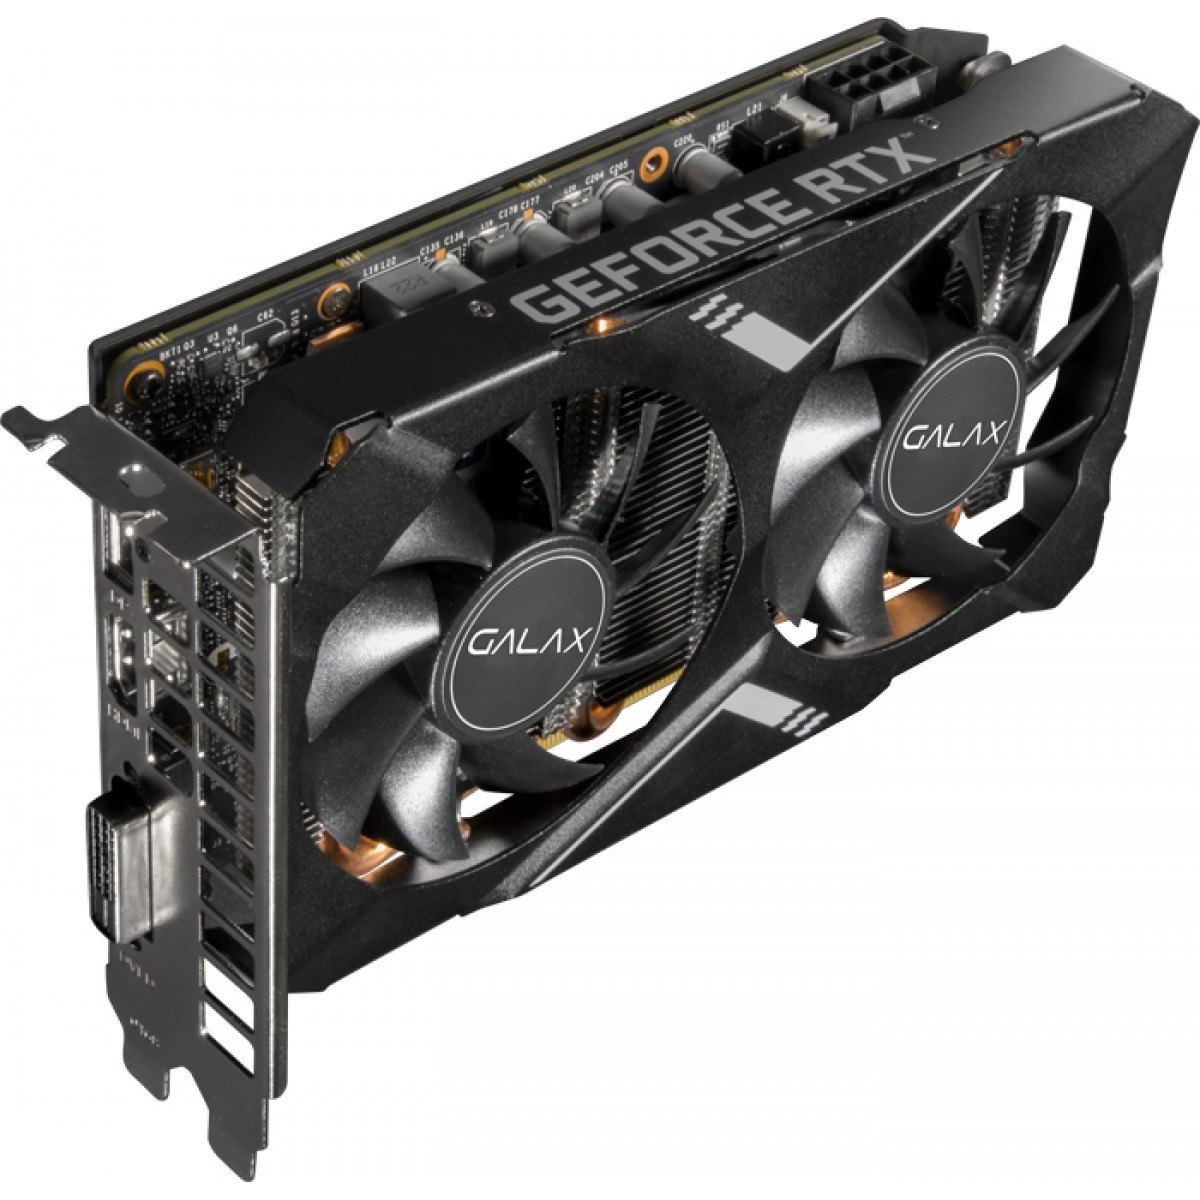 Placa de Vídeo Galax GeForce RTX 2060 Super Elite, 8GB GDDR6, 256Bit, 26ISL6HP09MN